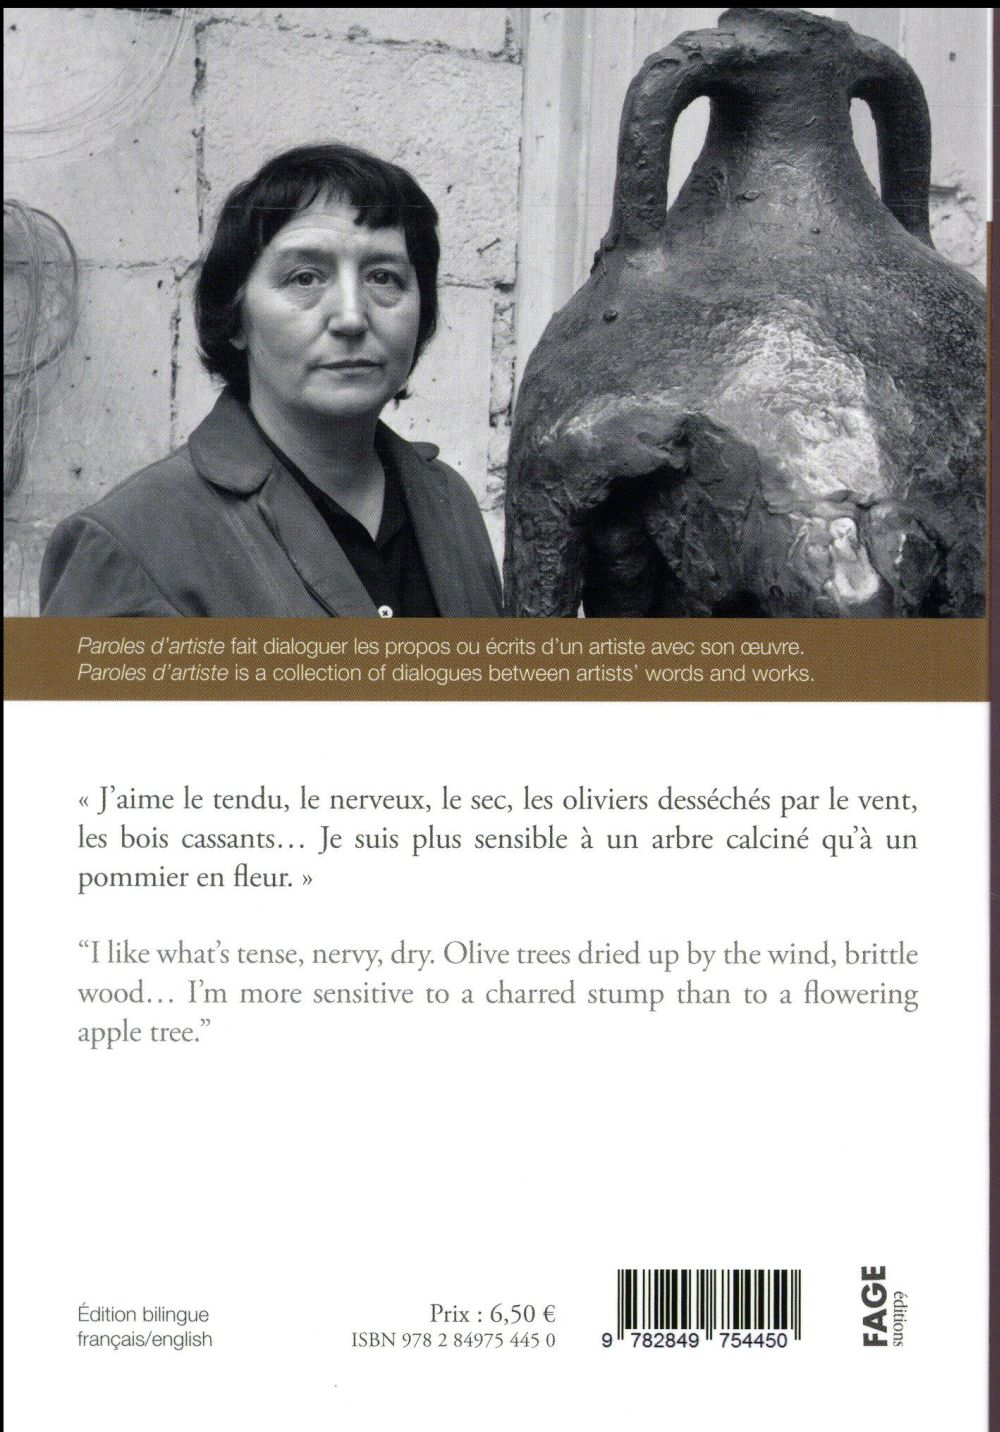 Germaine Richier